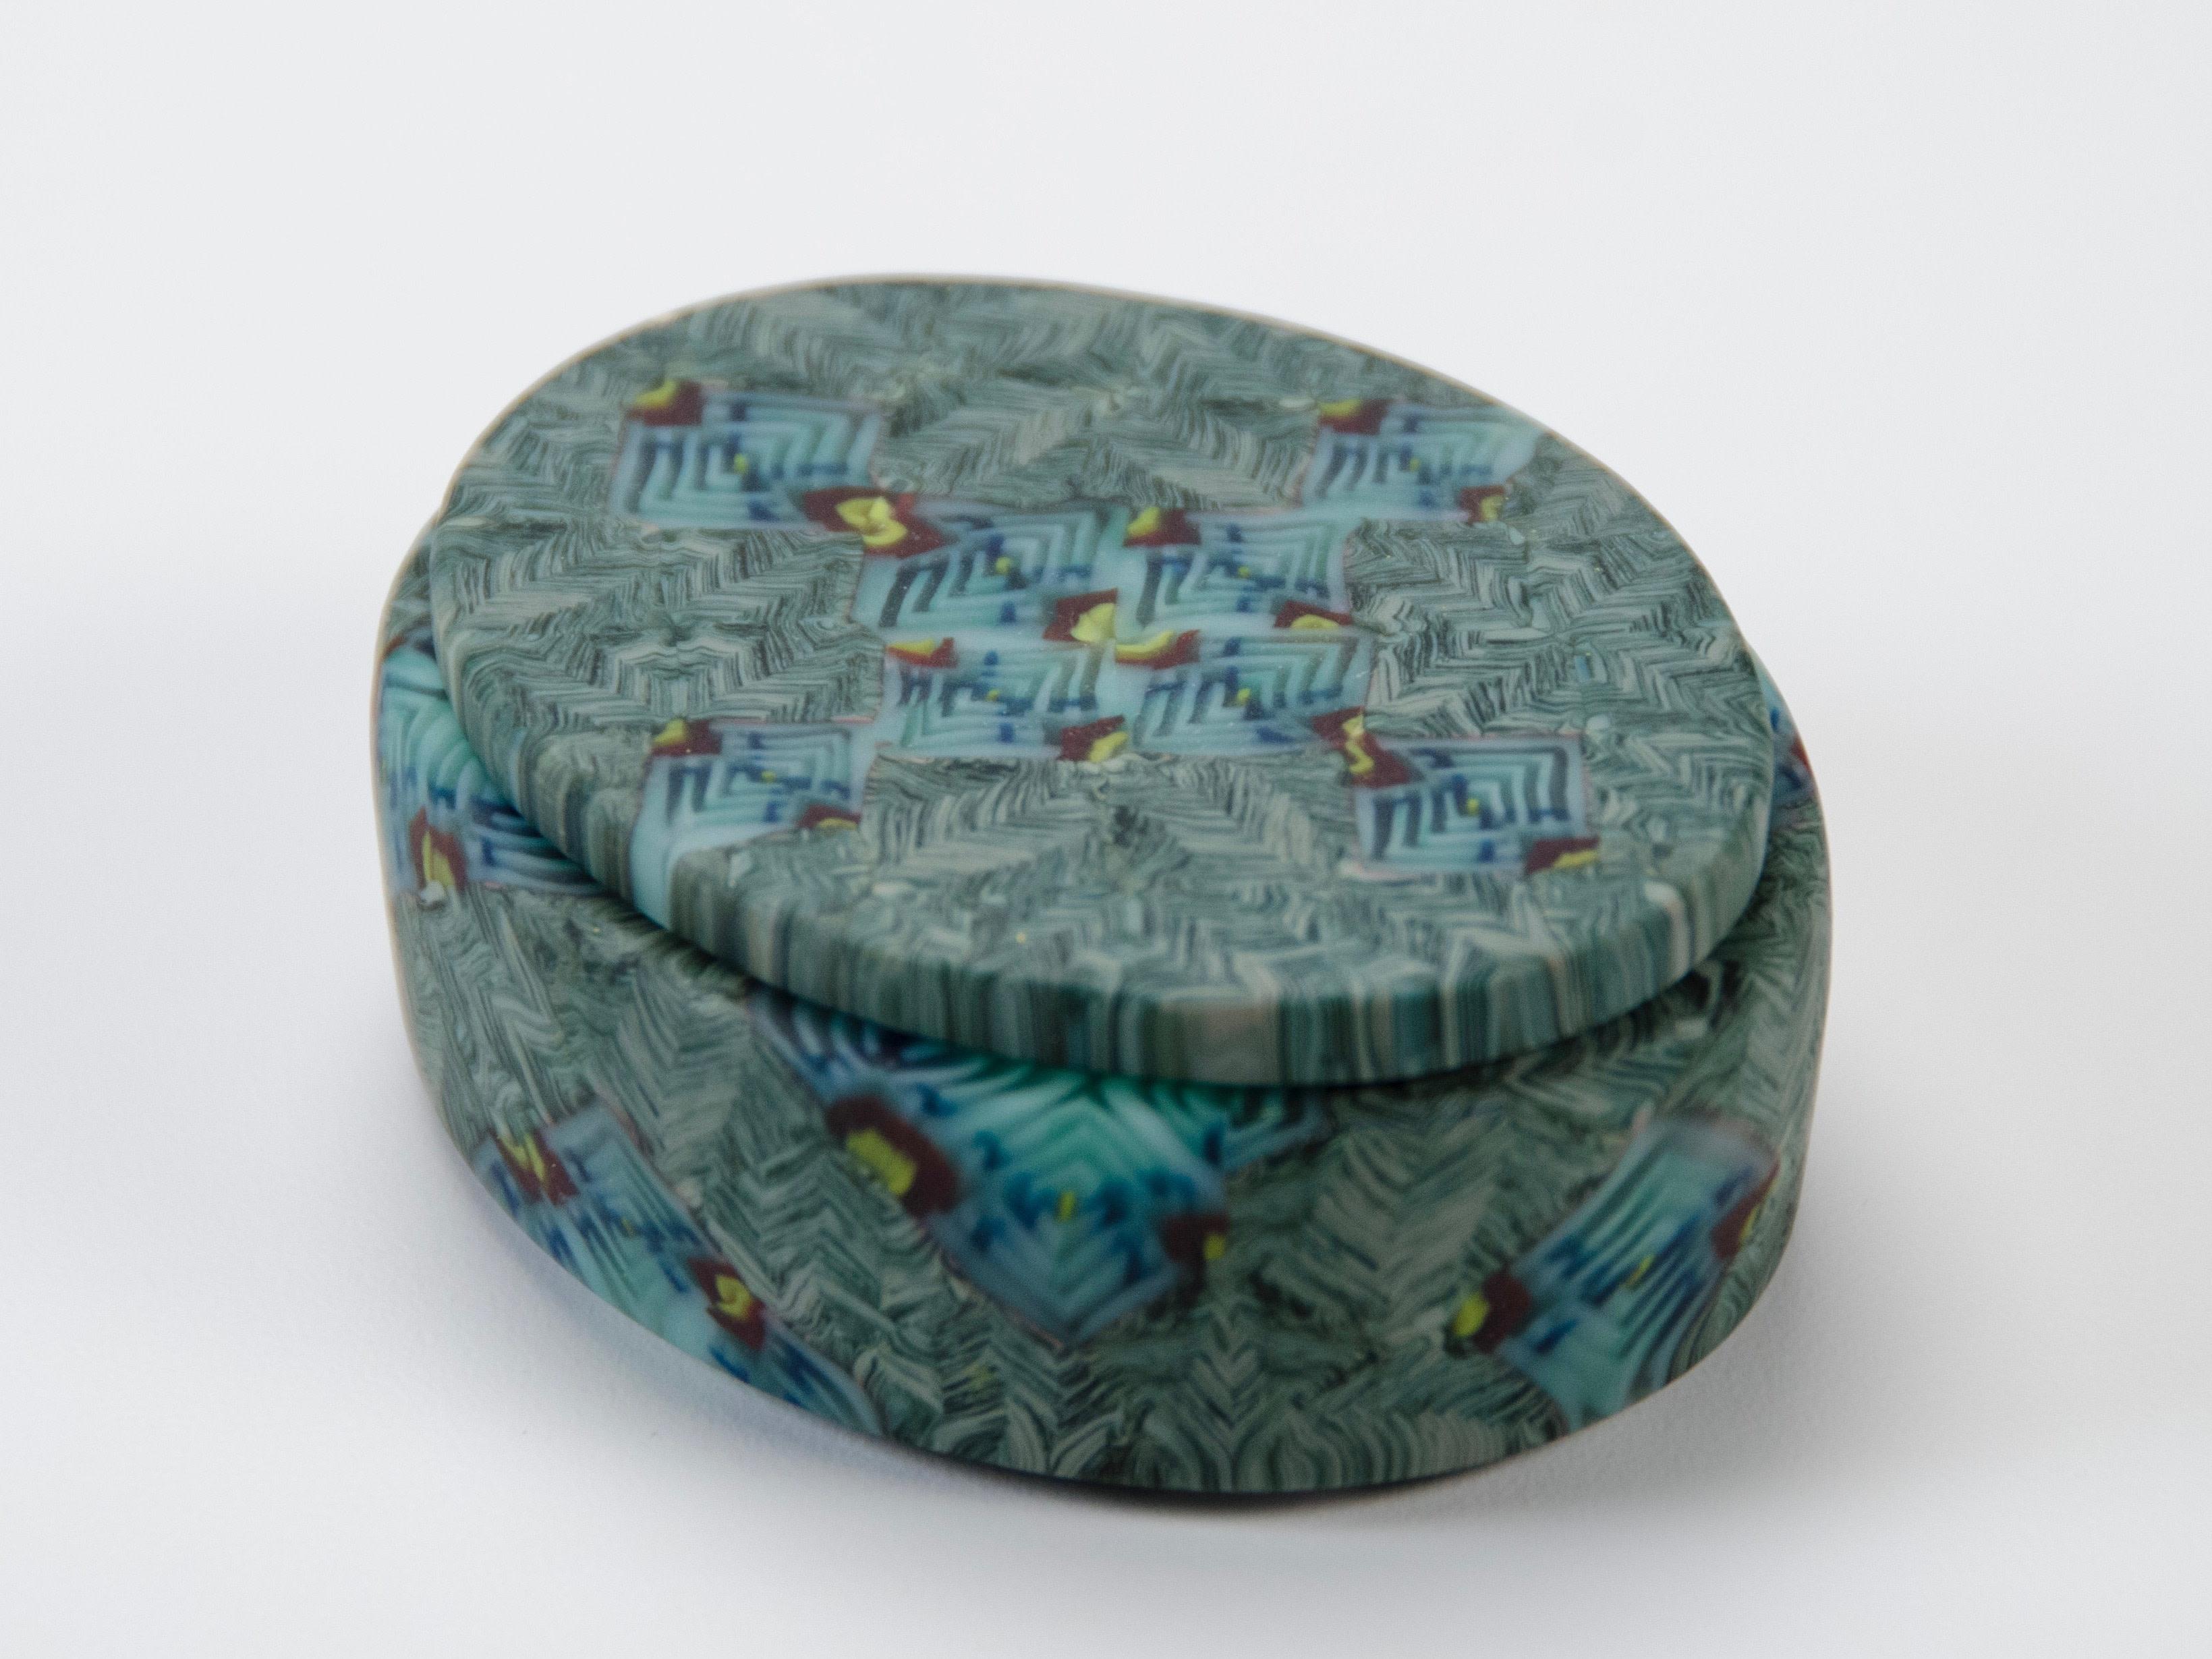 Yoko Yagi, Small Box, kilnformed and coldworked murrine glass